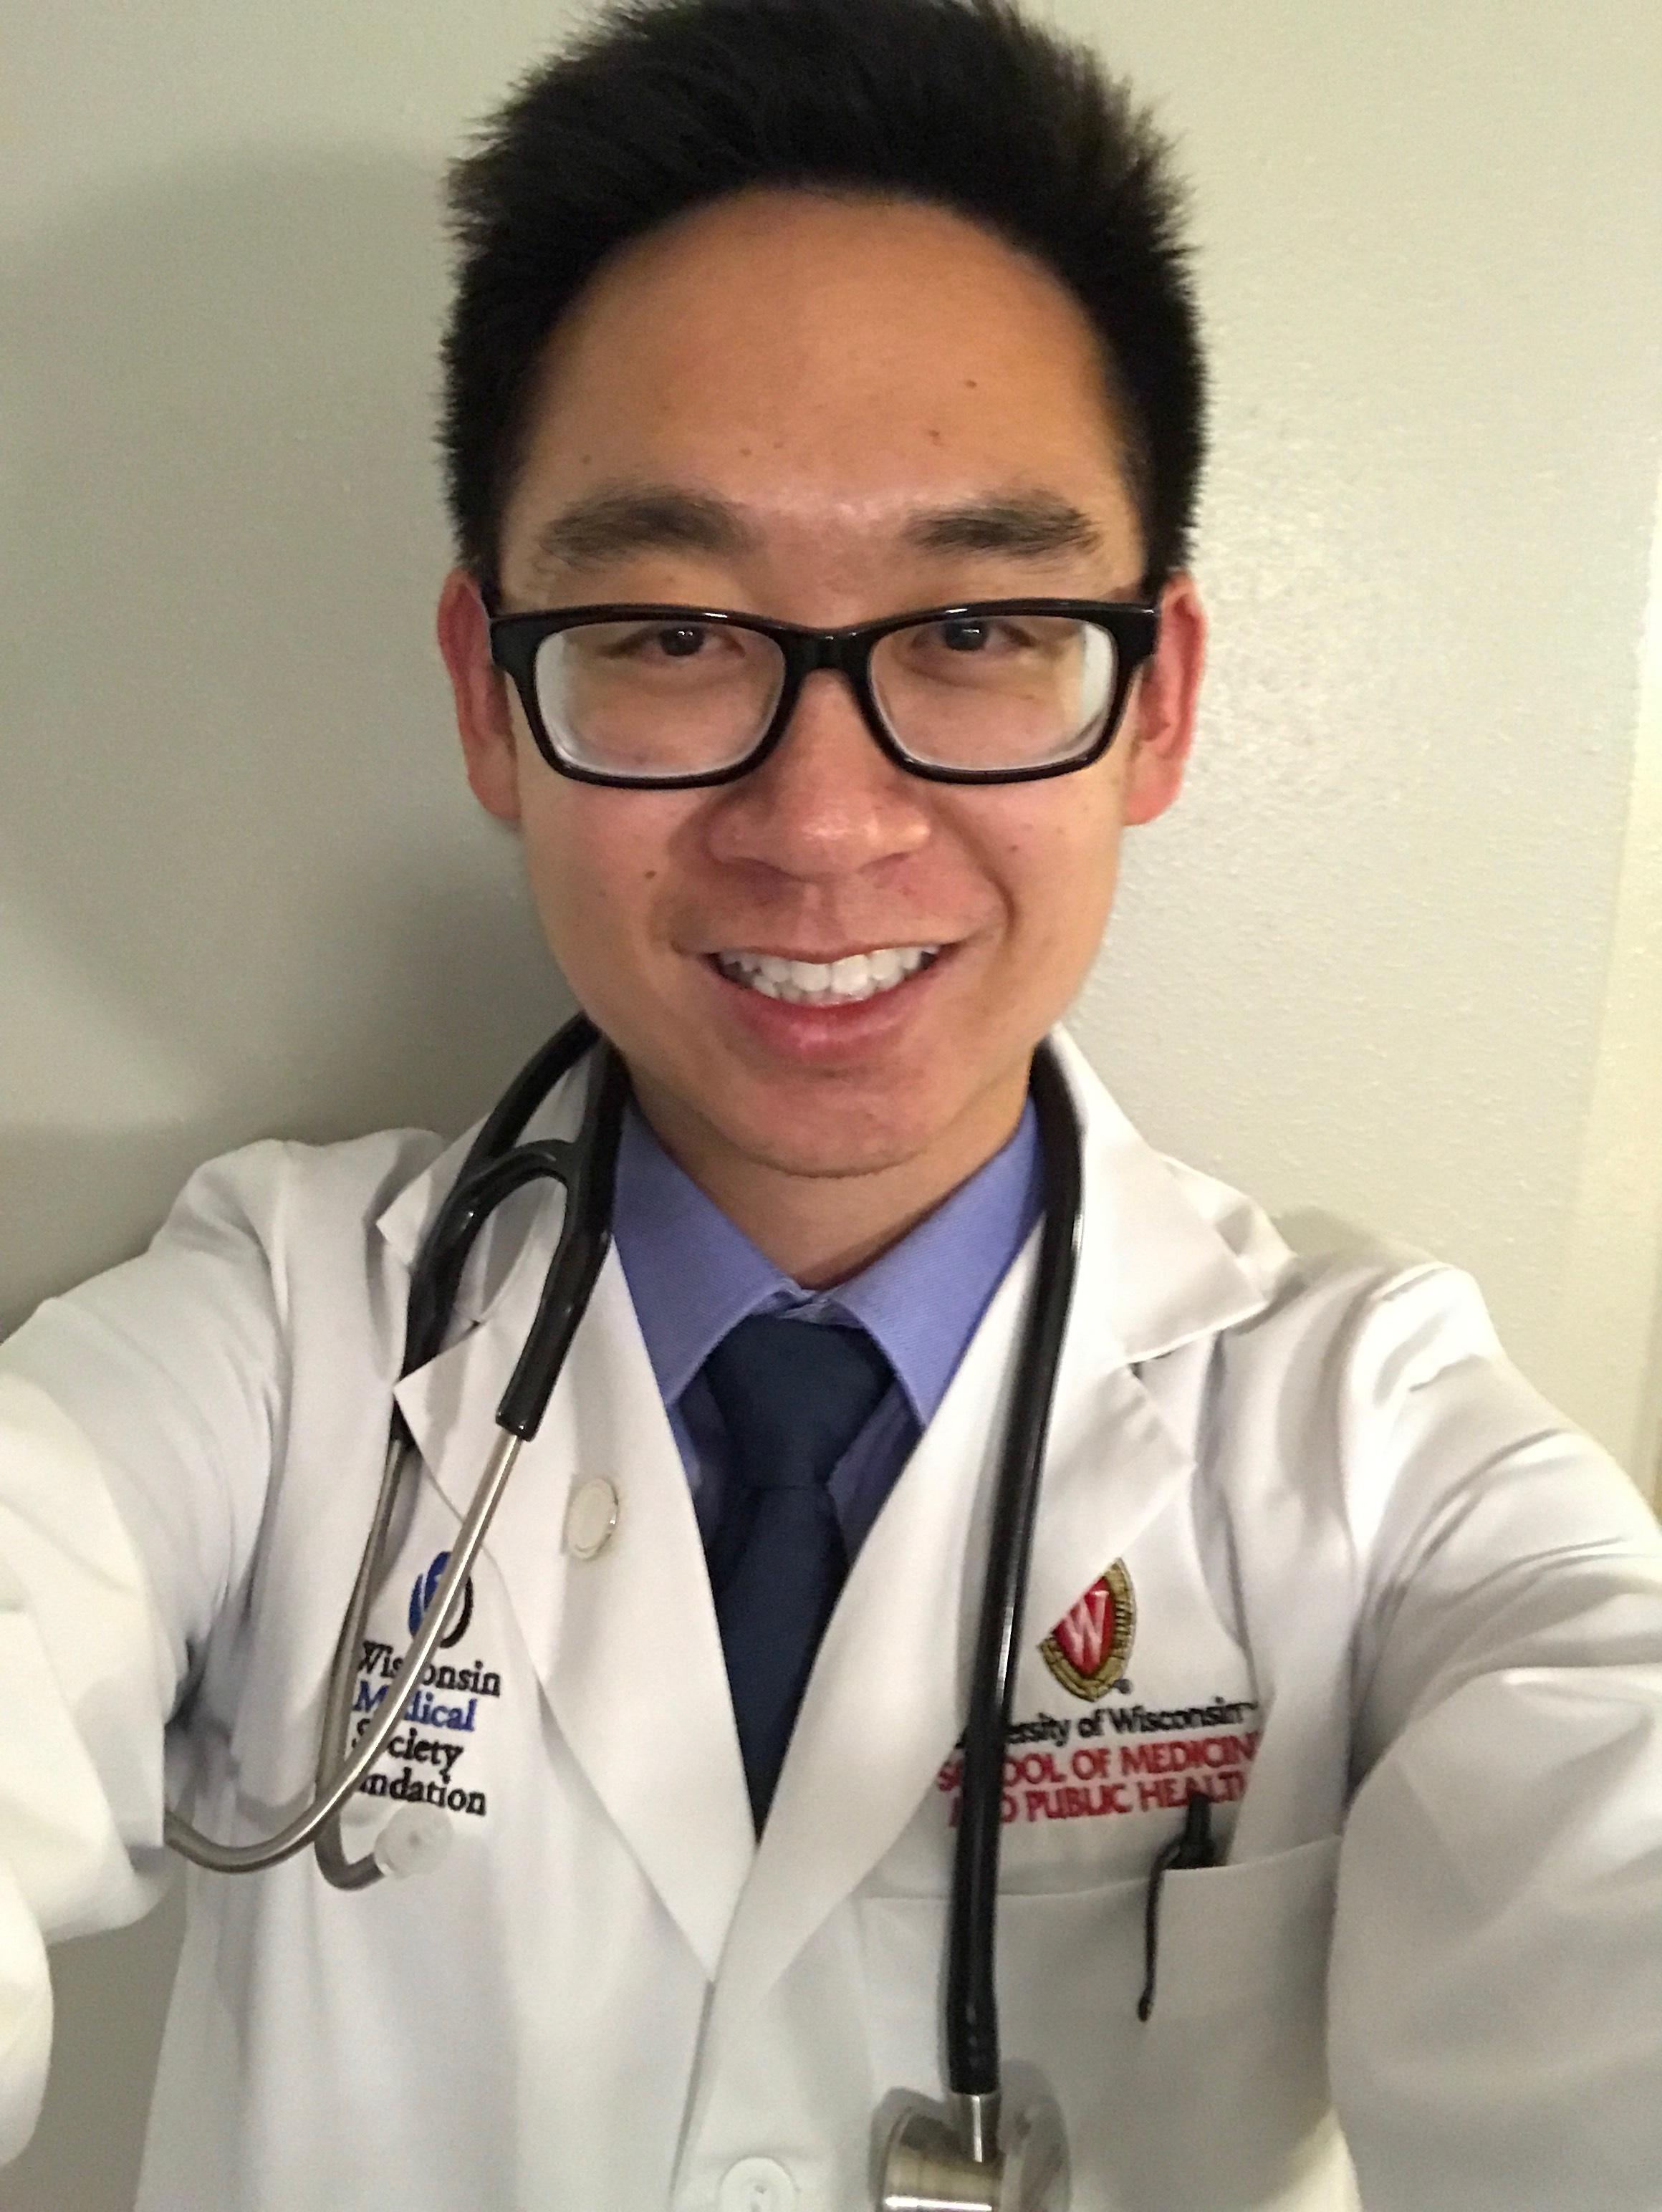 Truman Ngyuen - Year in medical school: third yearHometown: Garden Grove, CAHigh School: Rancho Alamitos High SchoolHCF role: Co-President